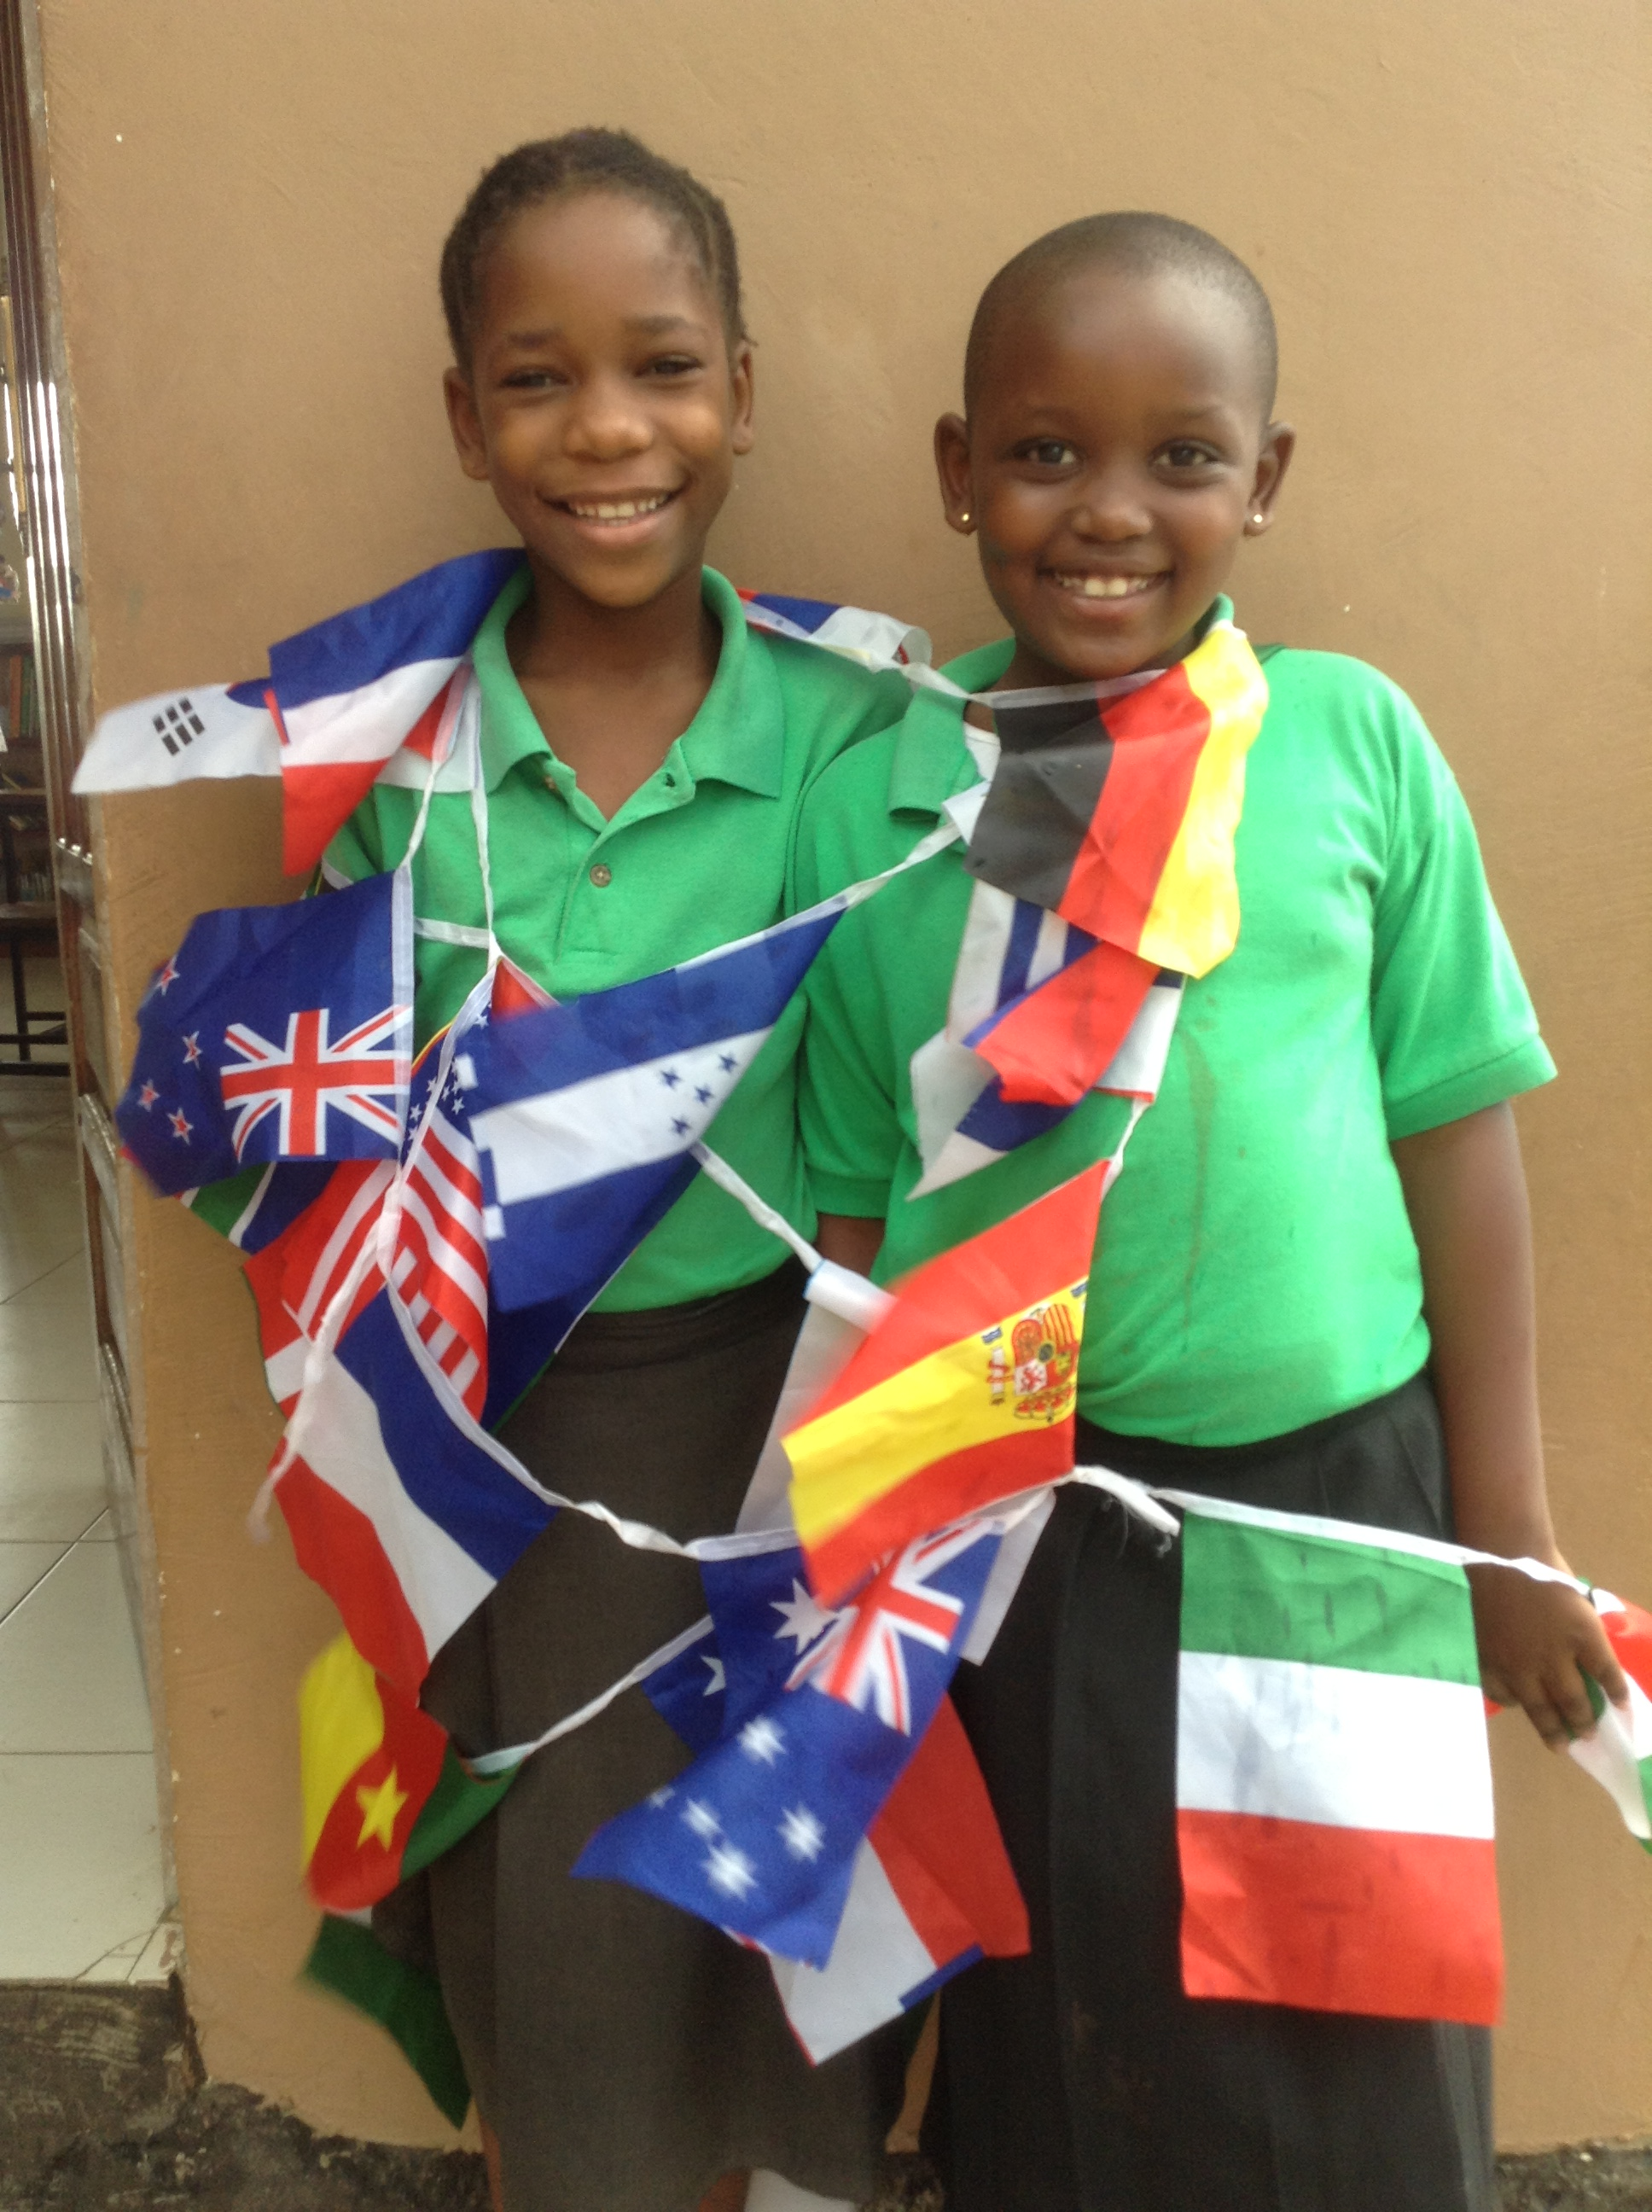 Lisa_and_Sabra_flags.JPG